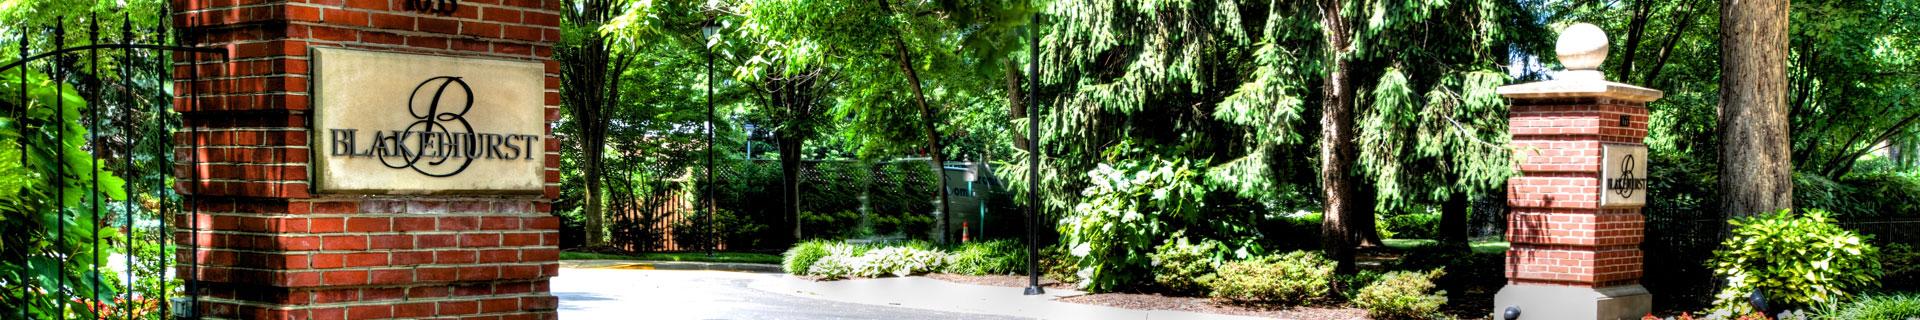 blakehurst entrance